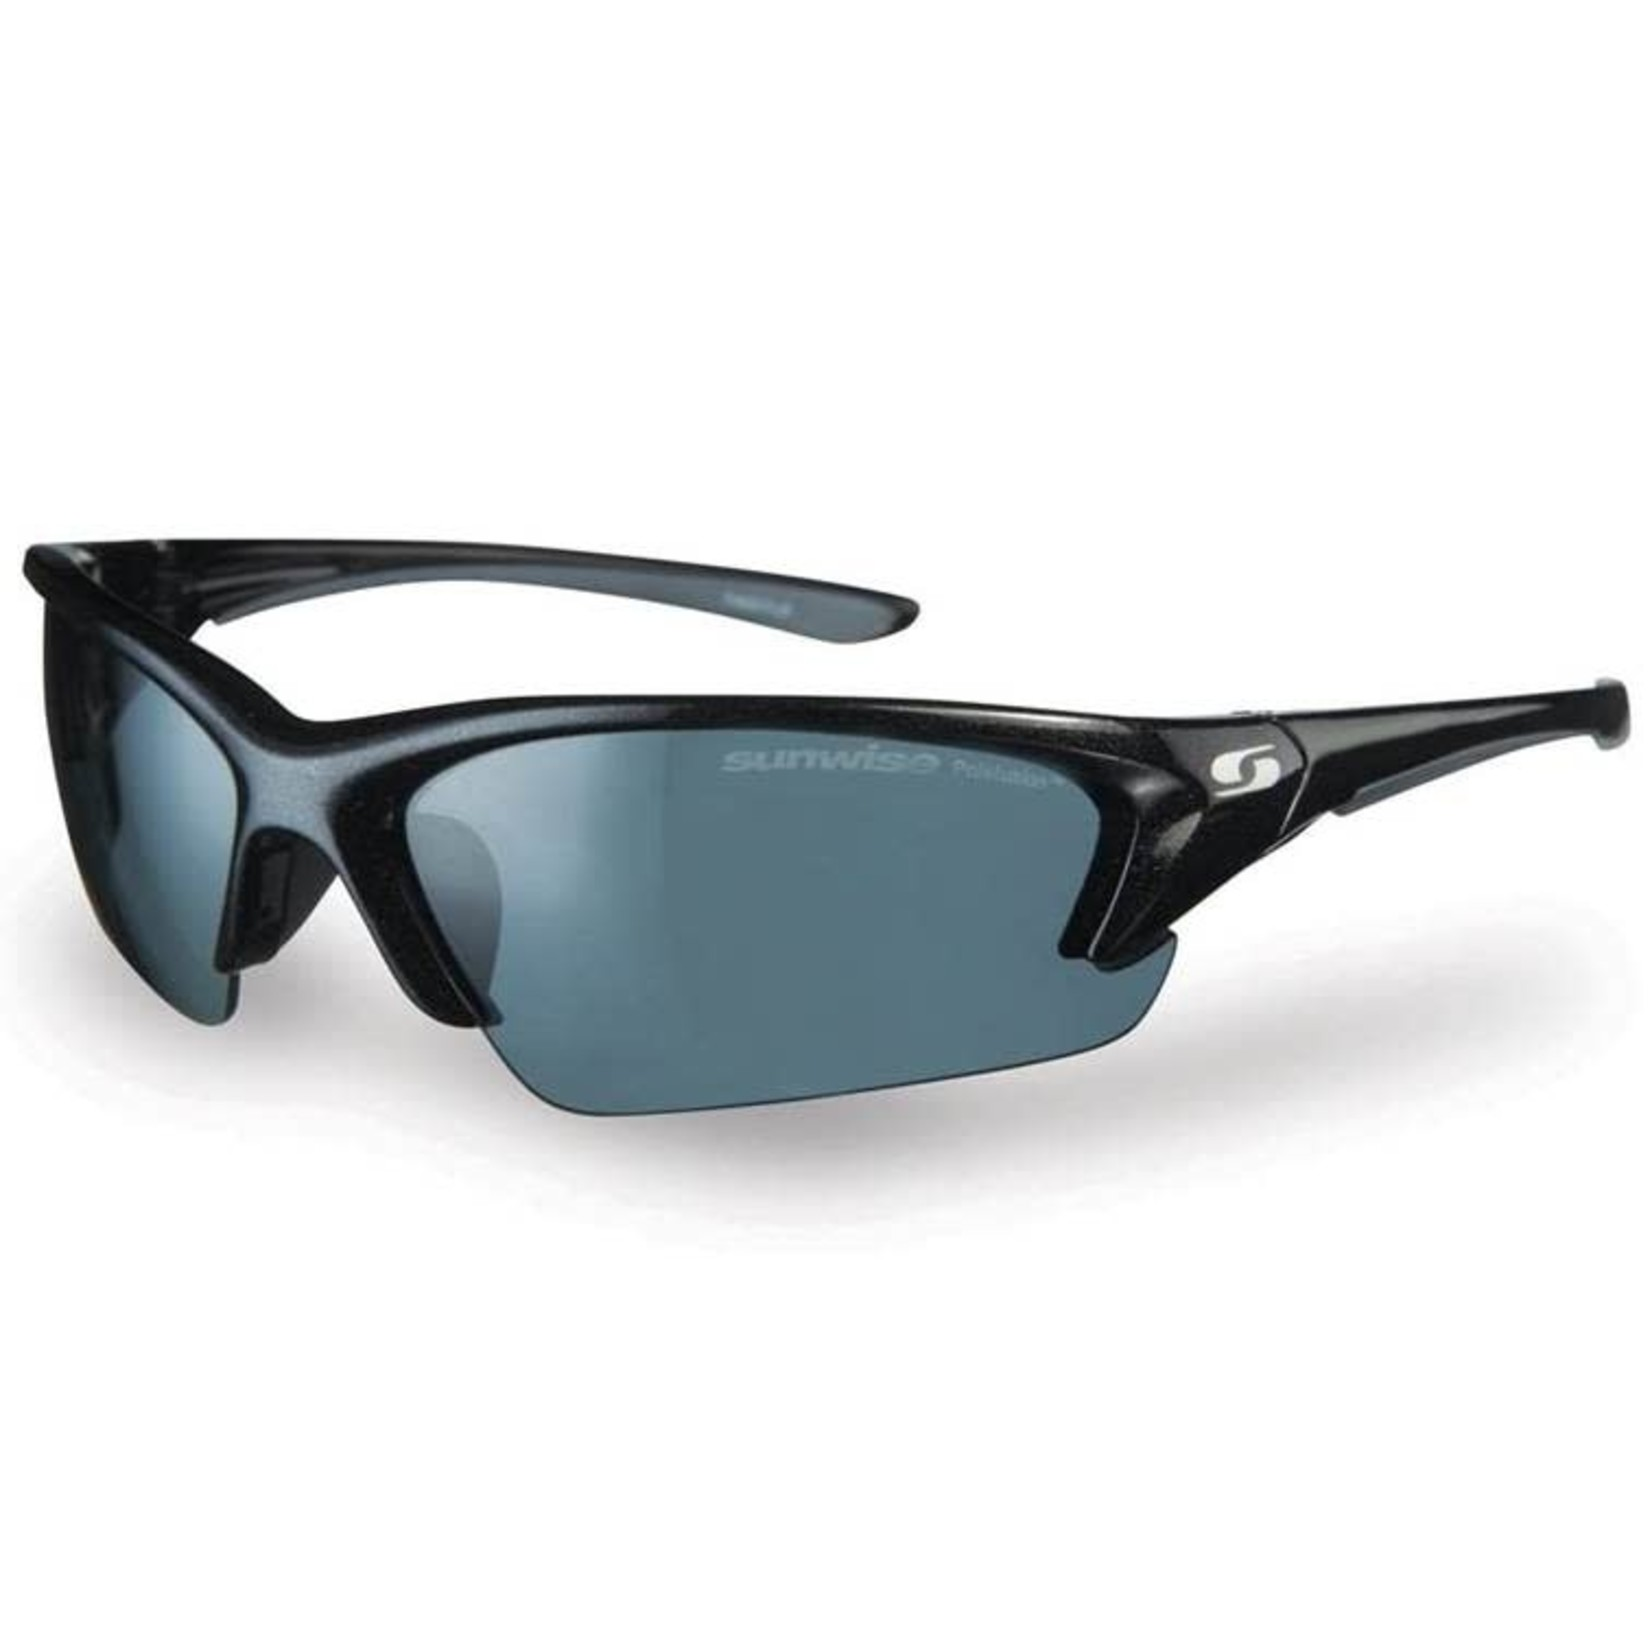 Sunwise Canary Wharf Sunglasses Black